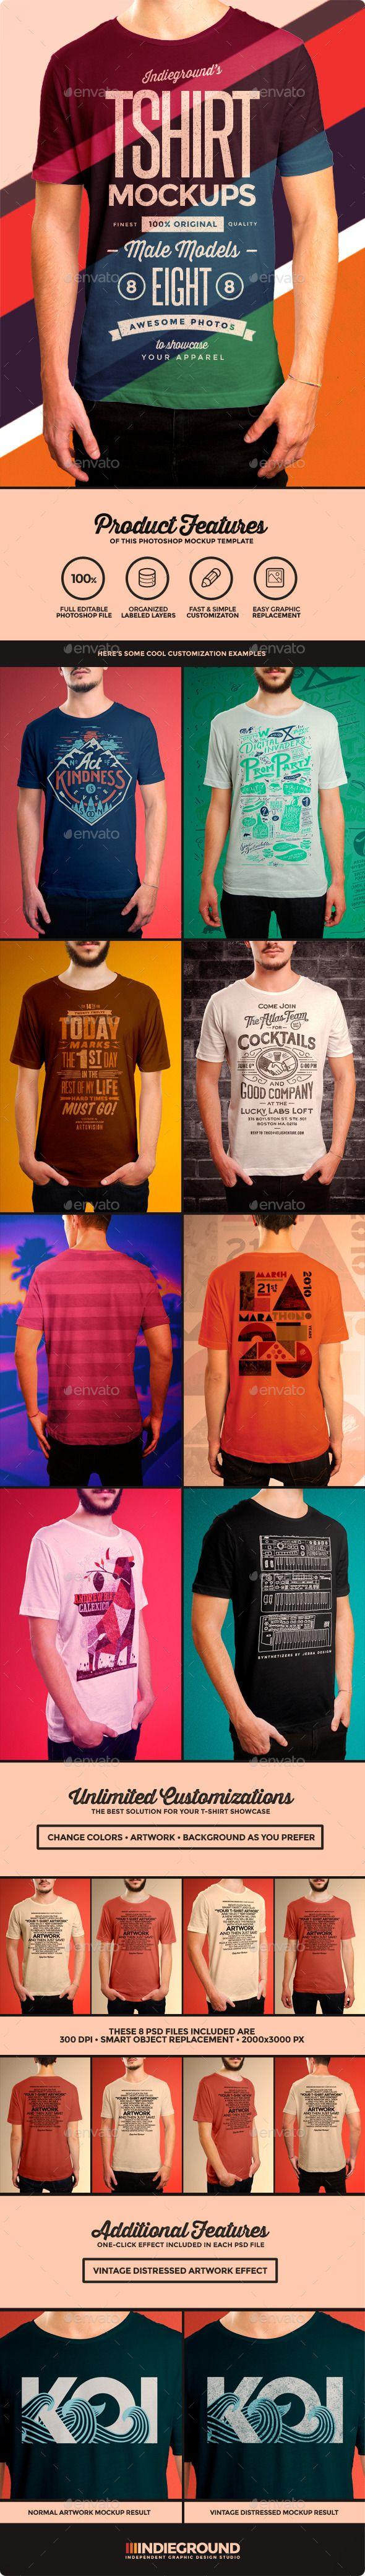 Scalable t shirt mockups more info - Men T Shirt Mockups